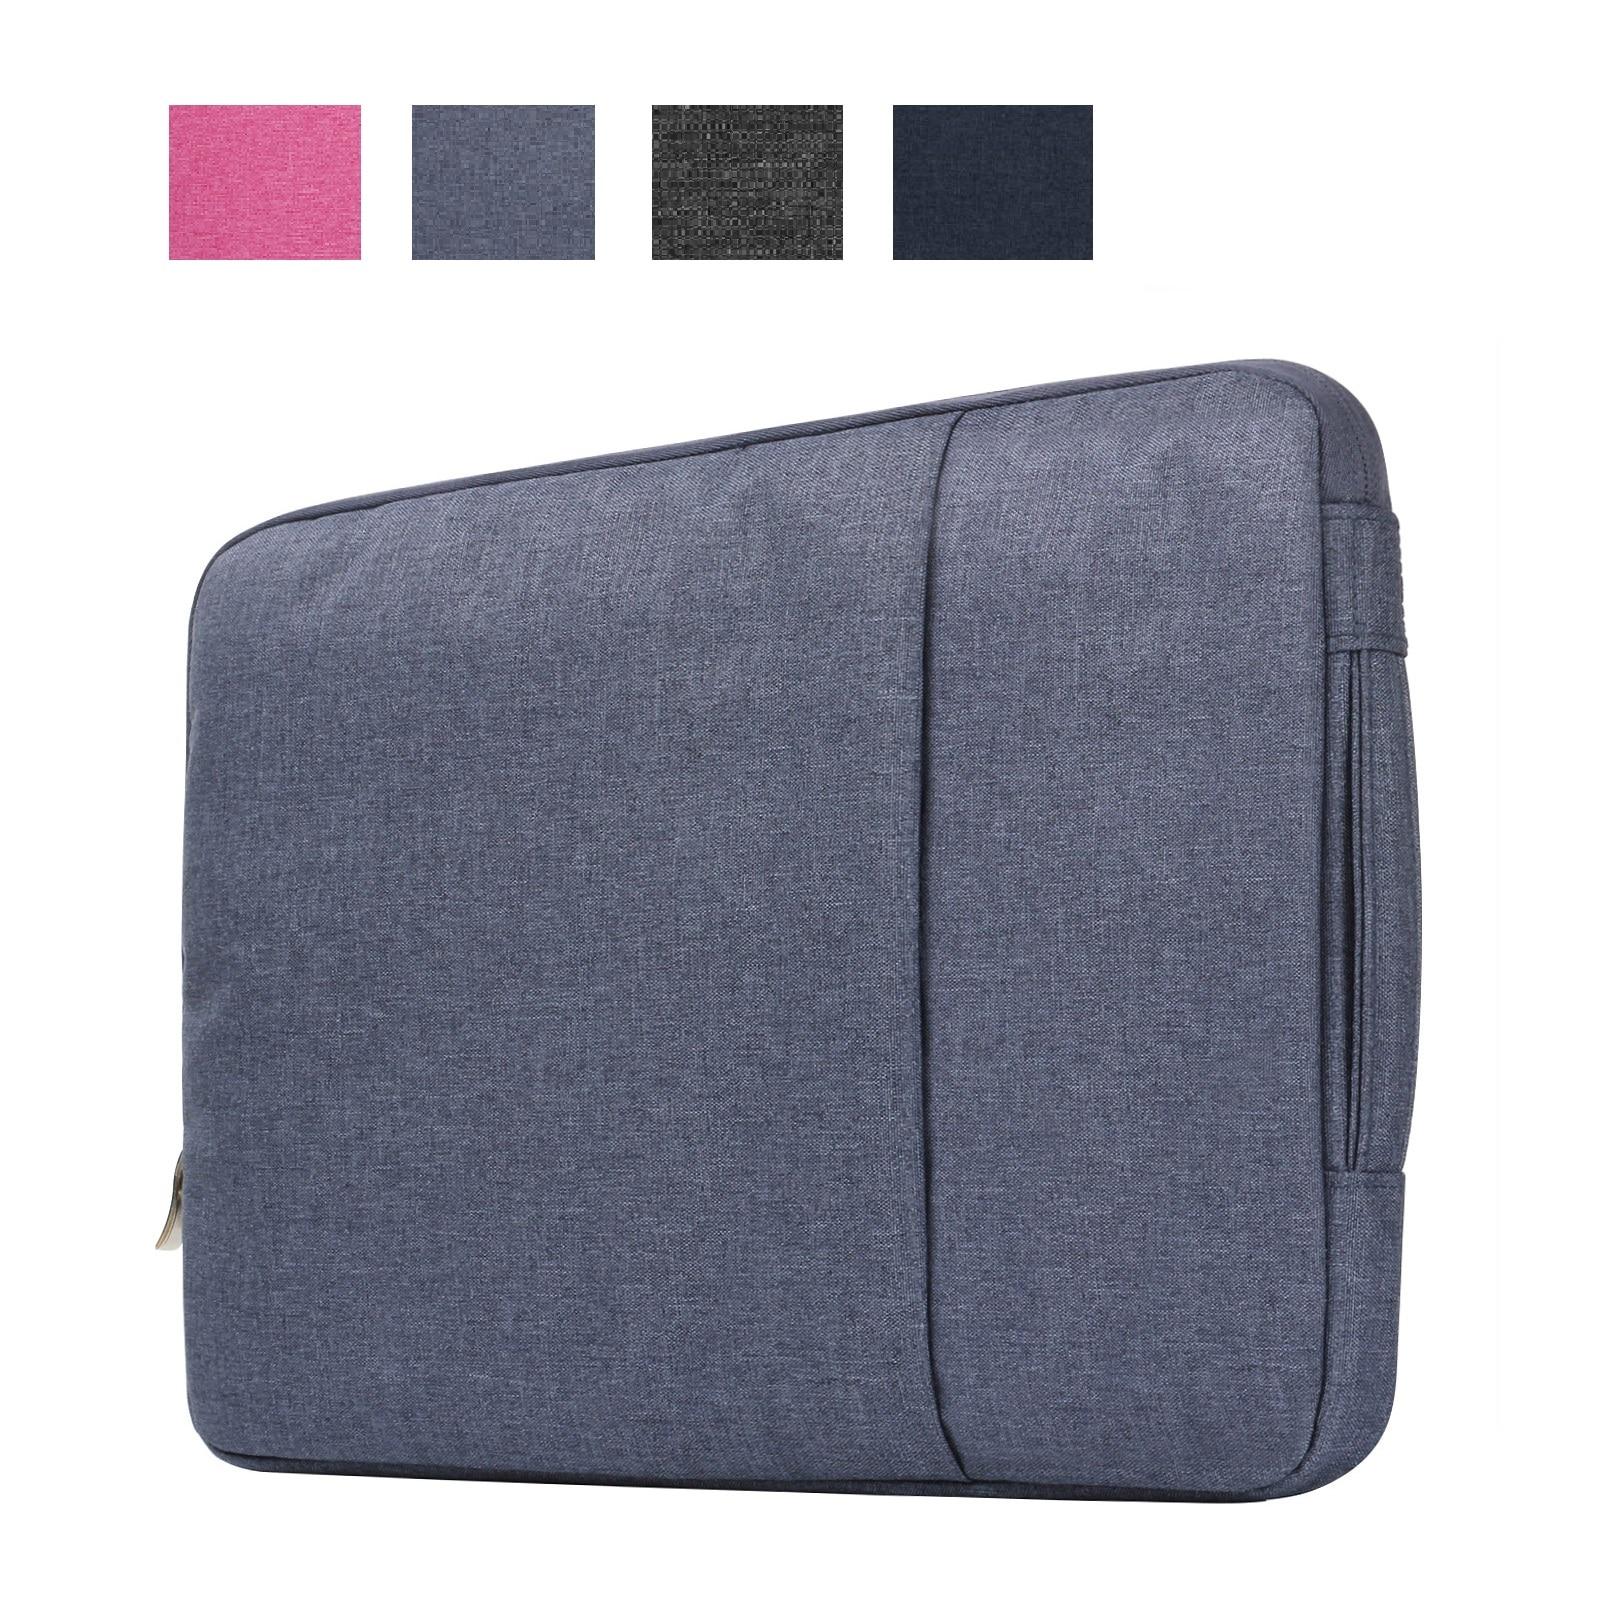 10 2 Handbag Case For iPad 8th Generation 2020 10 2 Bag Sleeve Cover 2020 A2429